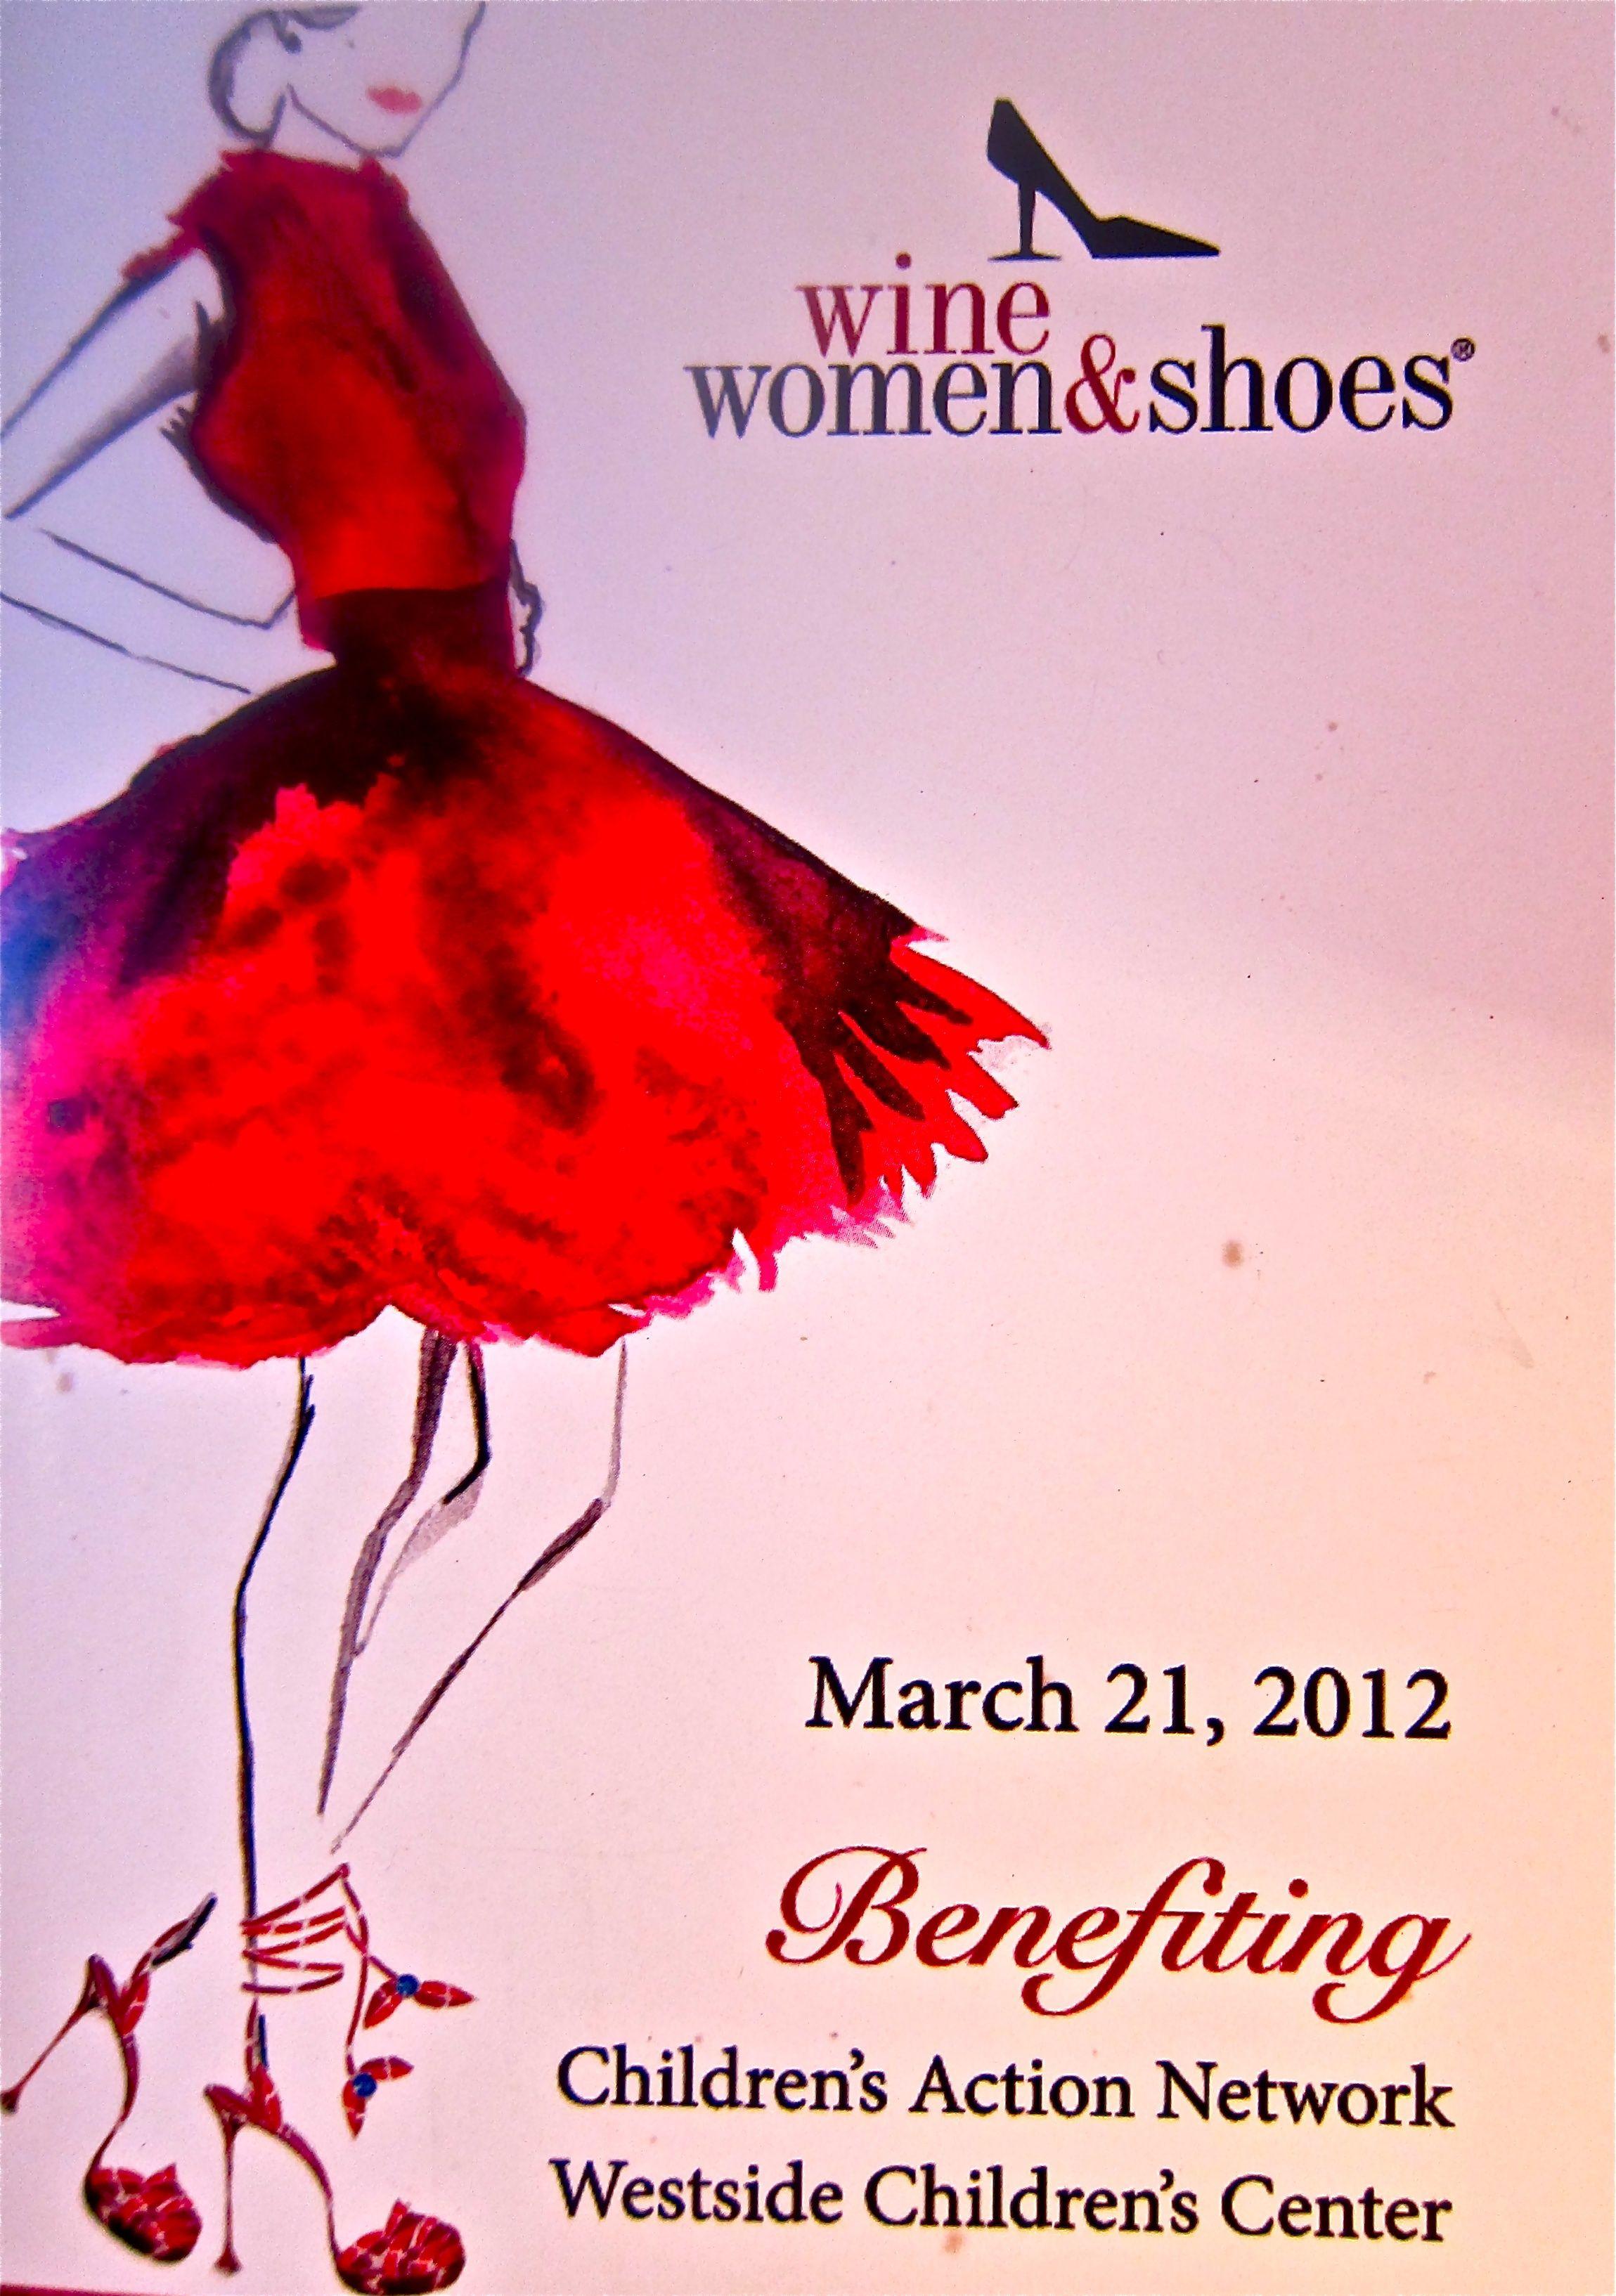 Wine Women And Shoes Make For A Wonderful Charity Benefit Progetti Da Provare